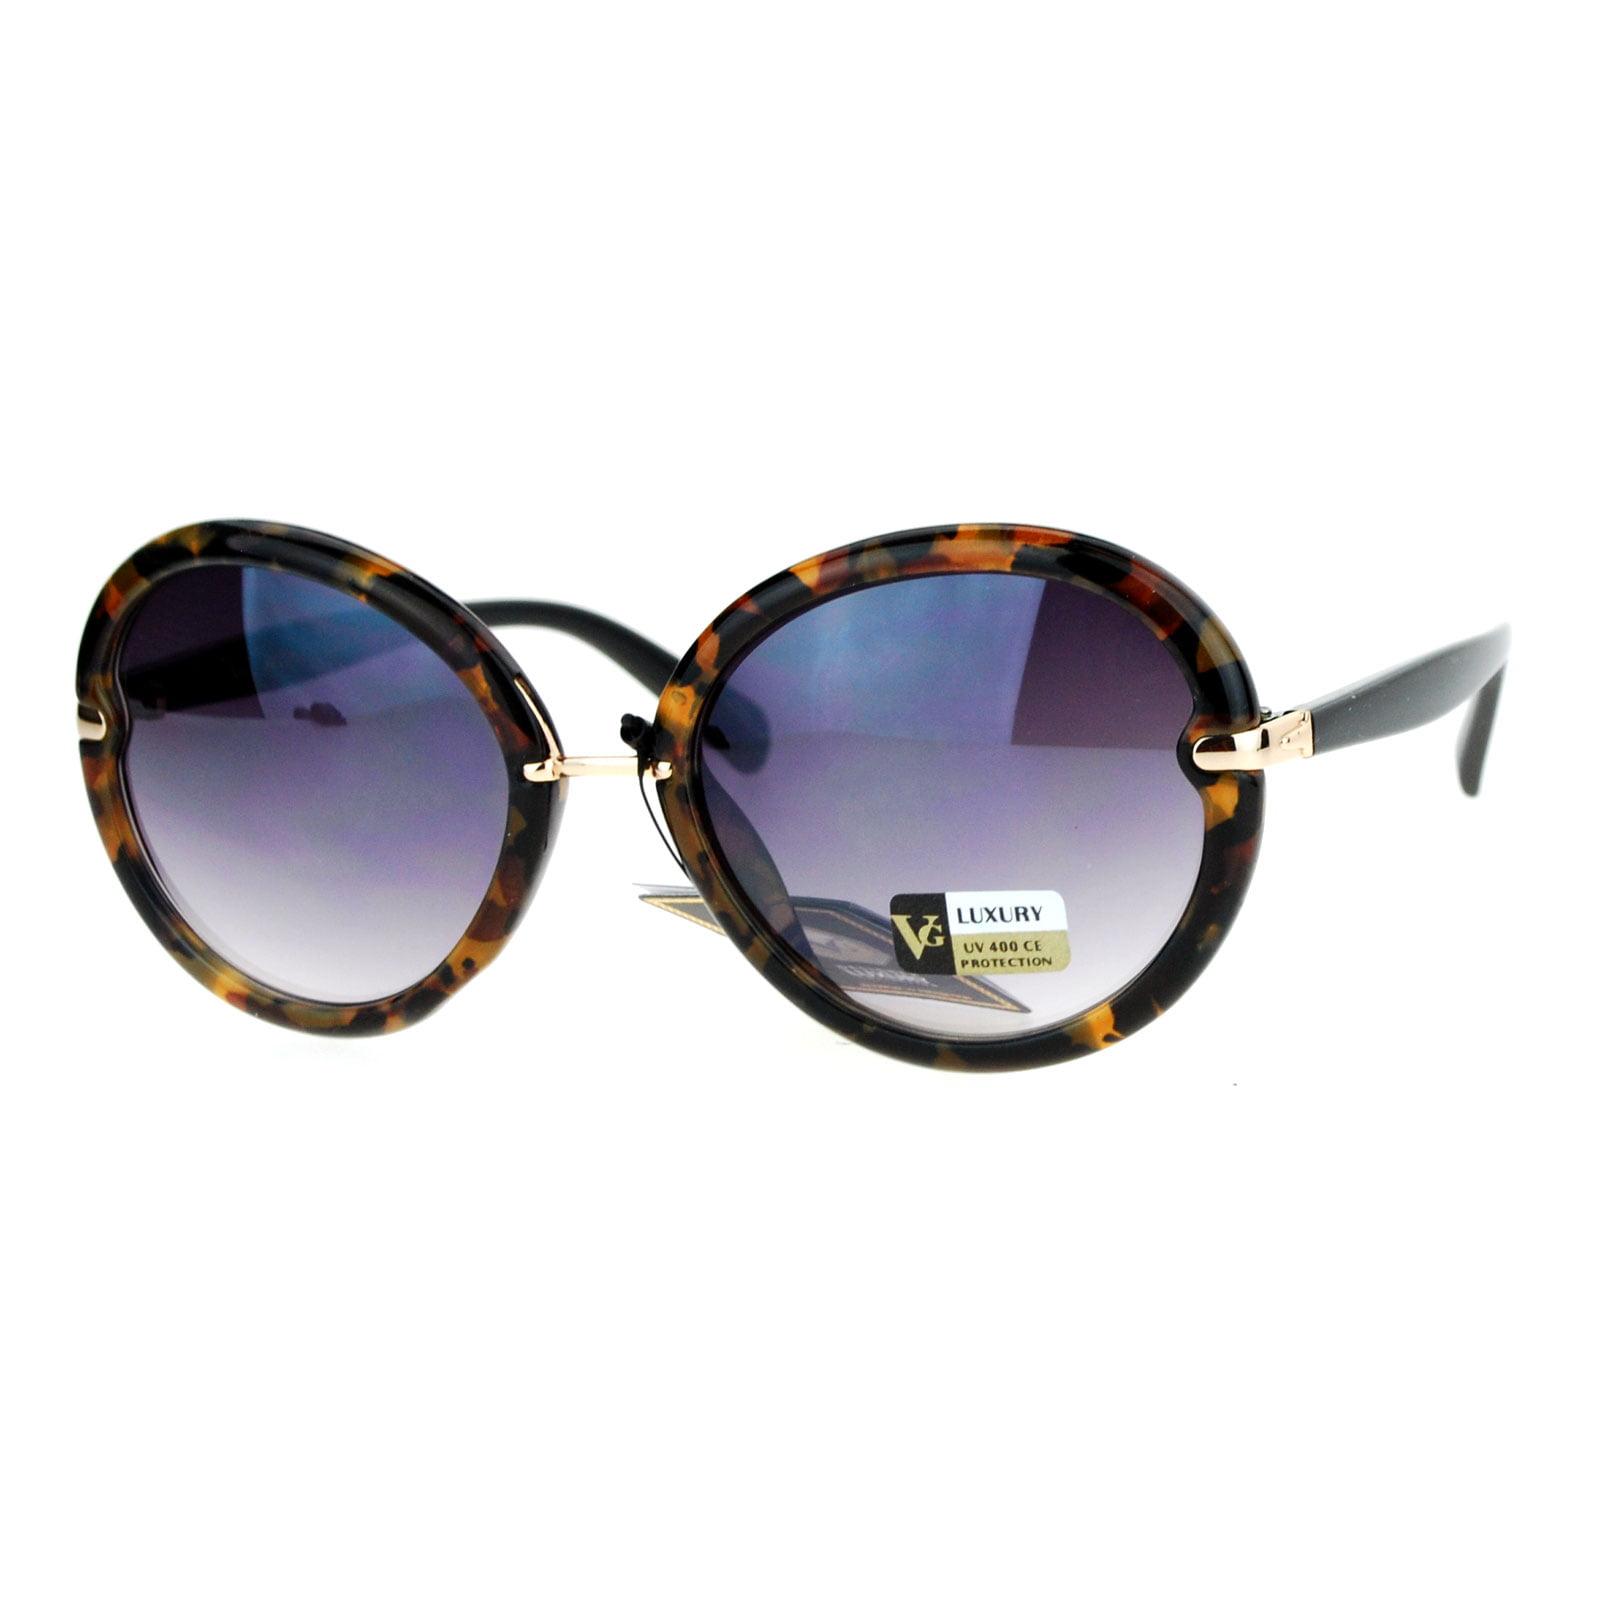 SA106 Designer Fashion Round Butterfly Oversize Sunglasses Tortoise Smoke